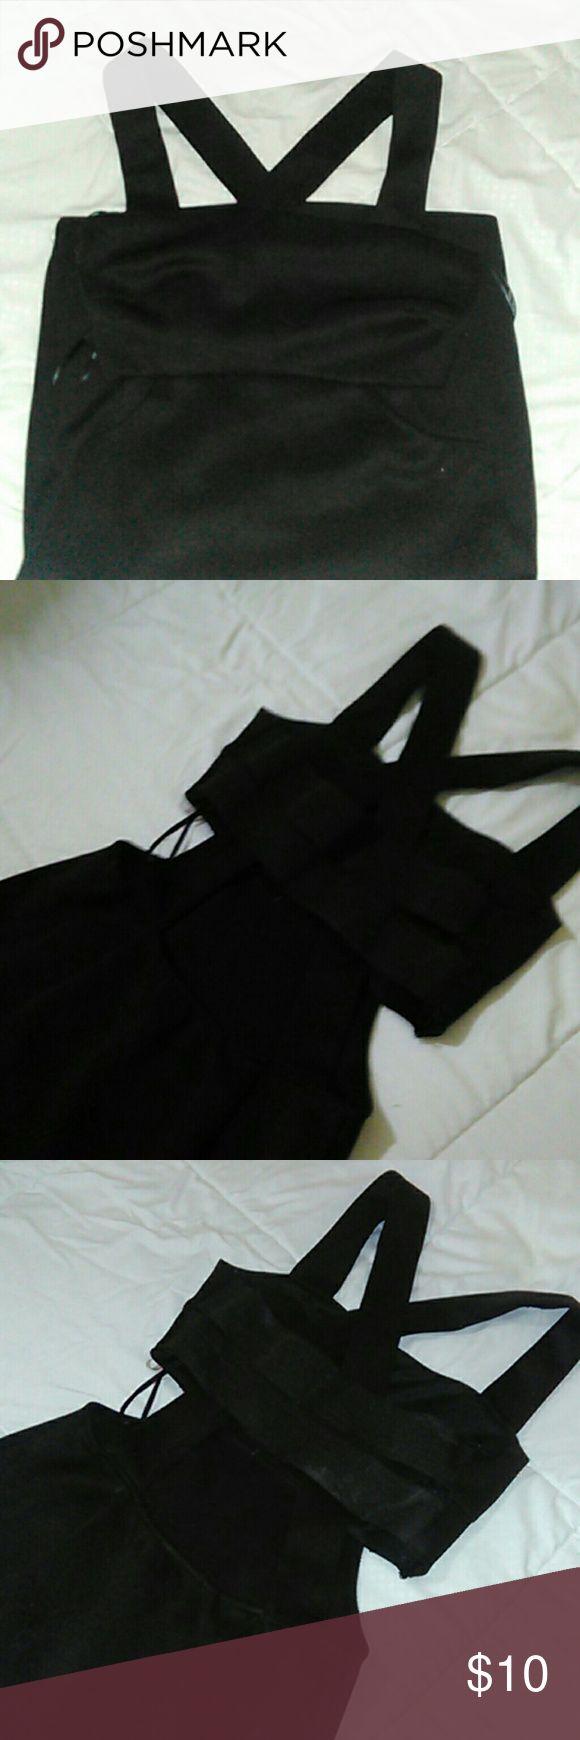 Black Crisscross Mini Dress Triangle sides cut out Form fitting Crisscross back detailing lower back exposures Forever 21 Dresses Mini